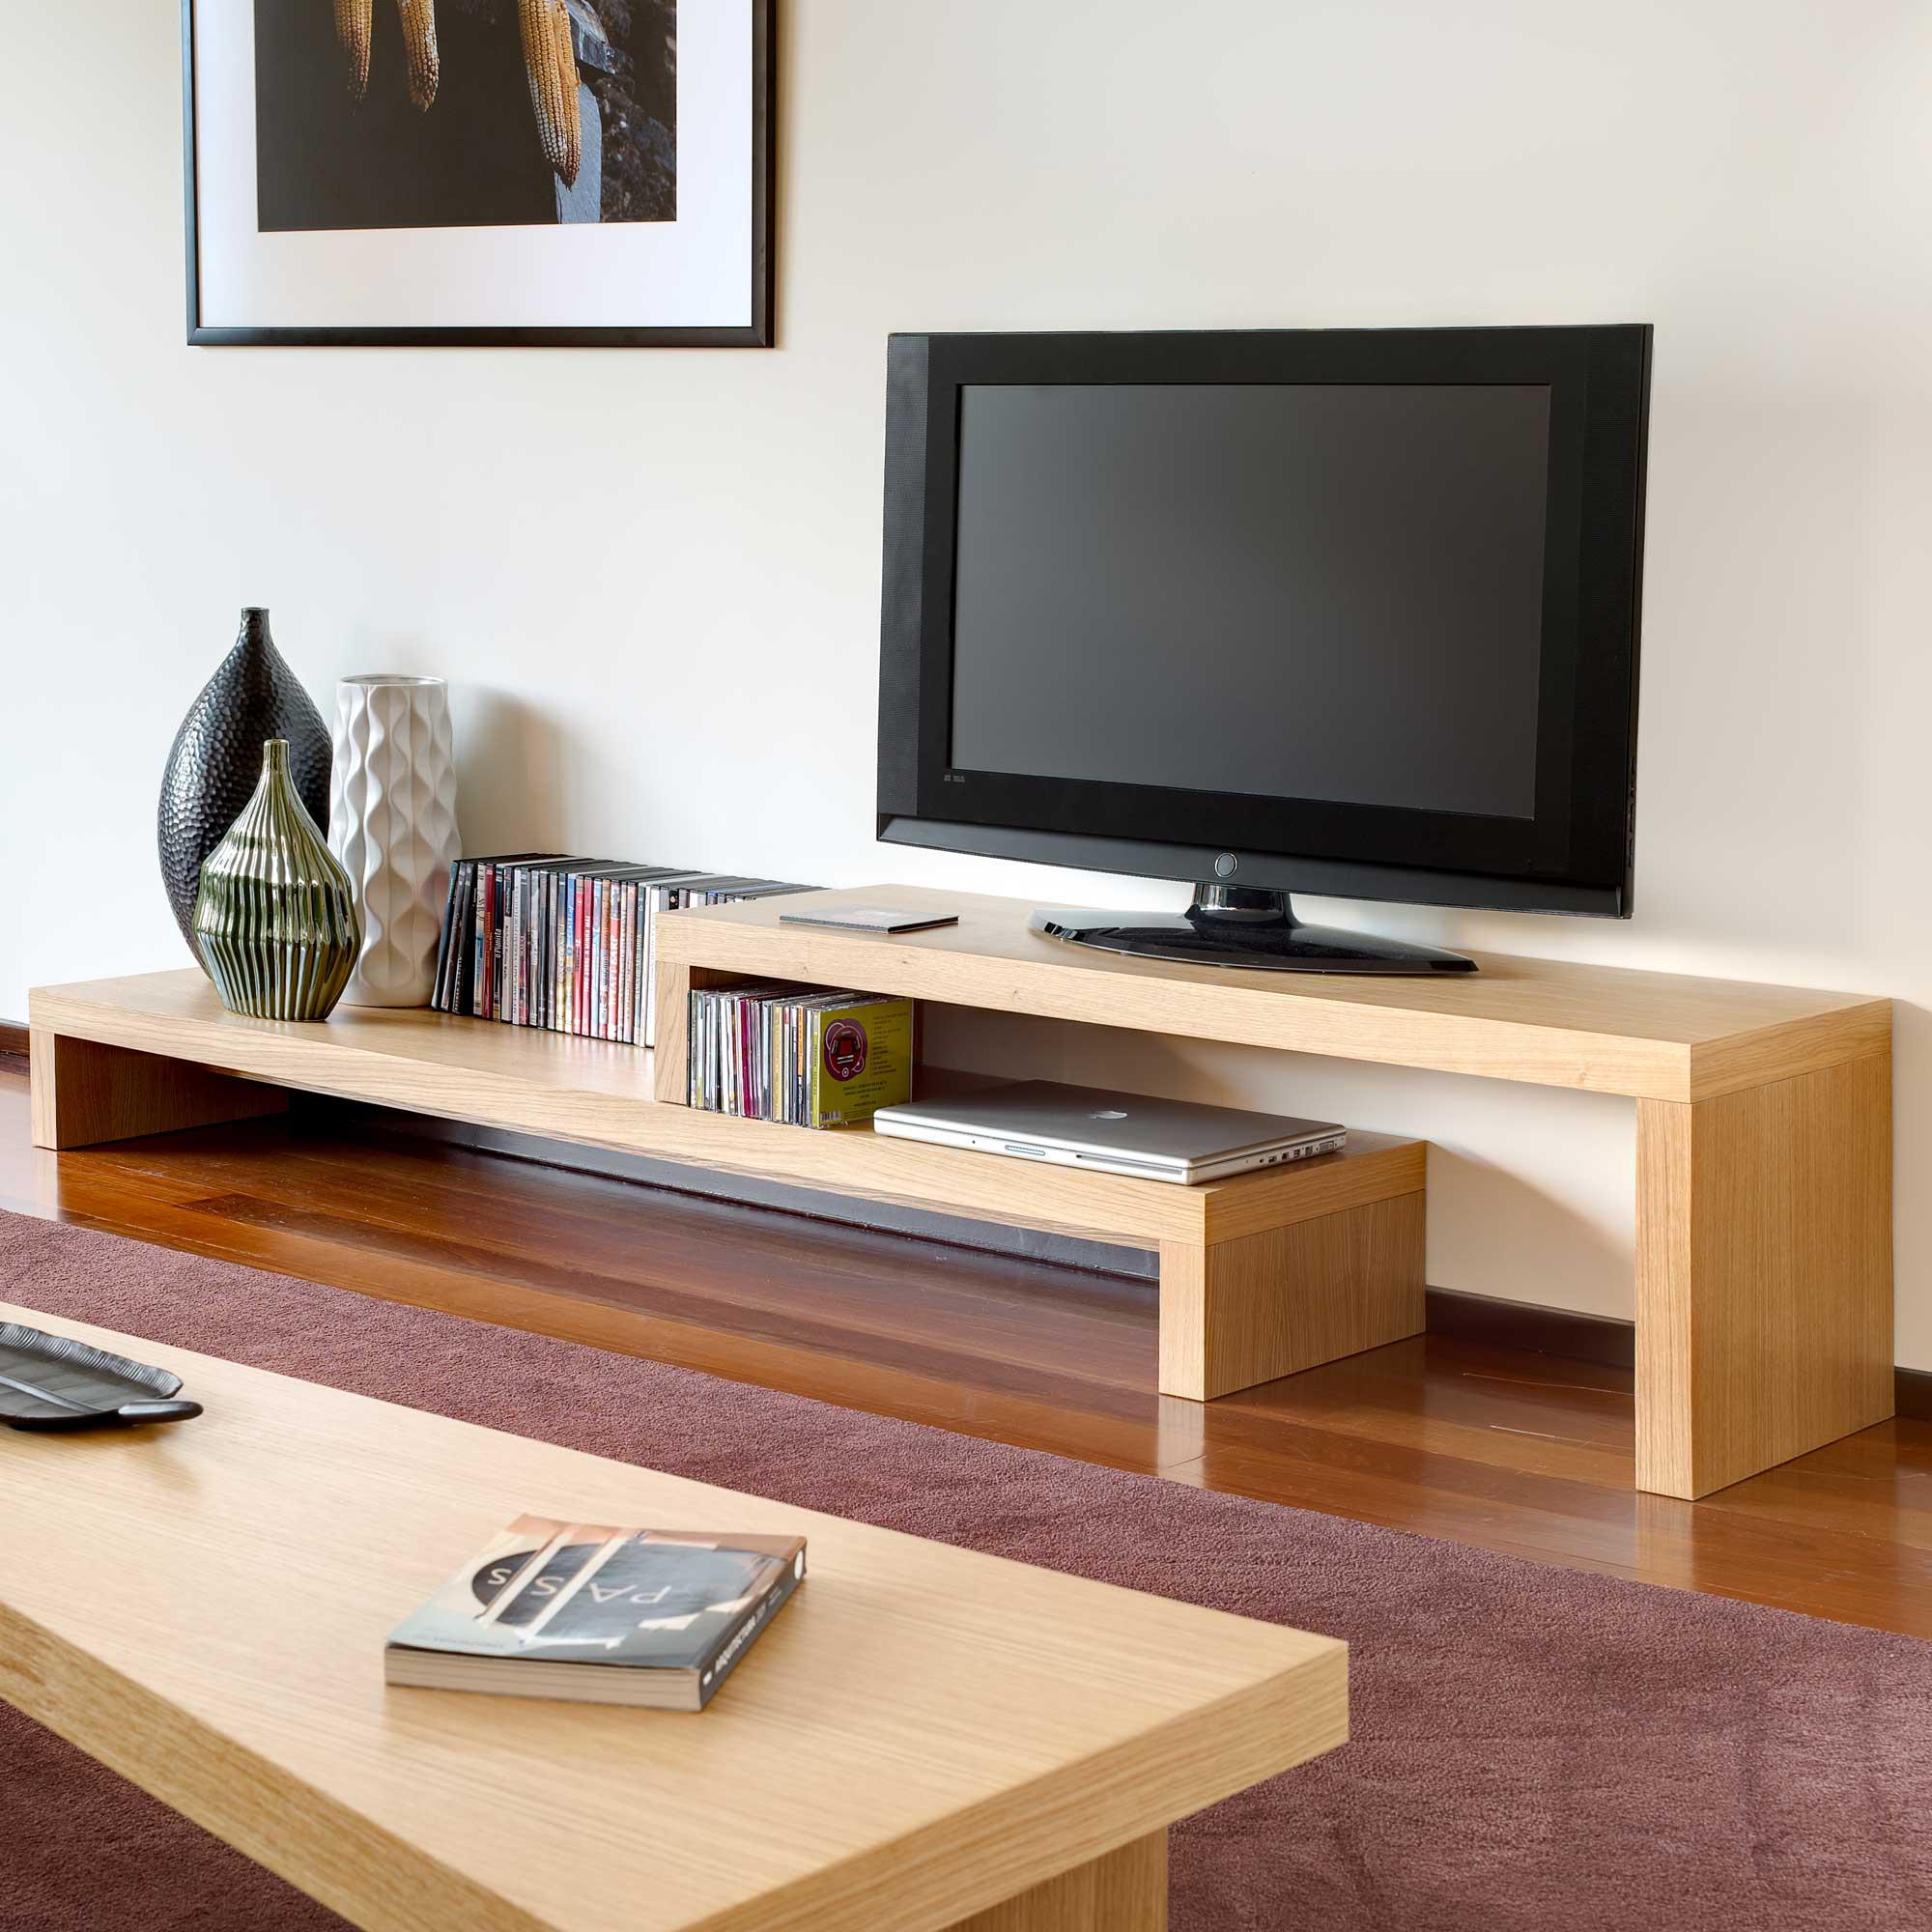 Fabriquer Son Meuble Tv - Comment Fabriquer Un Meuble Tv [mjhdah]http://brockfc.com/c/belle-fabriquer-meuble-tv-suspendu-fabriquer-un-meuble-tv-suspendu-artzein.jpg